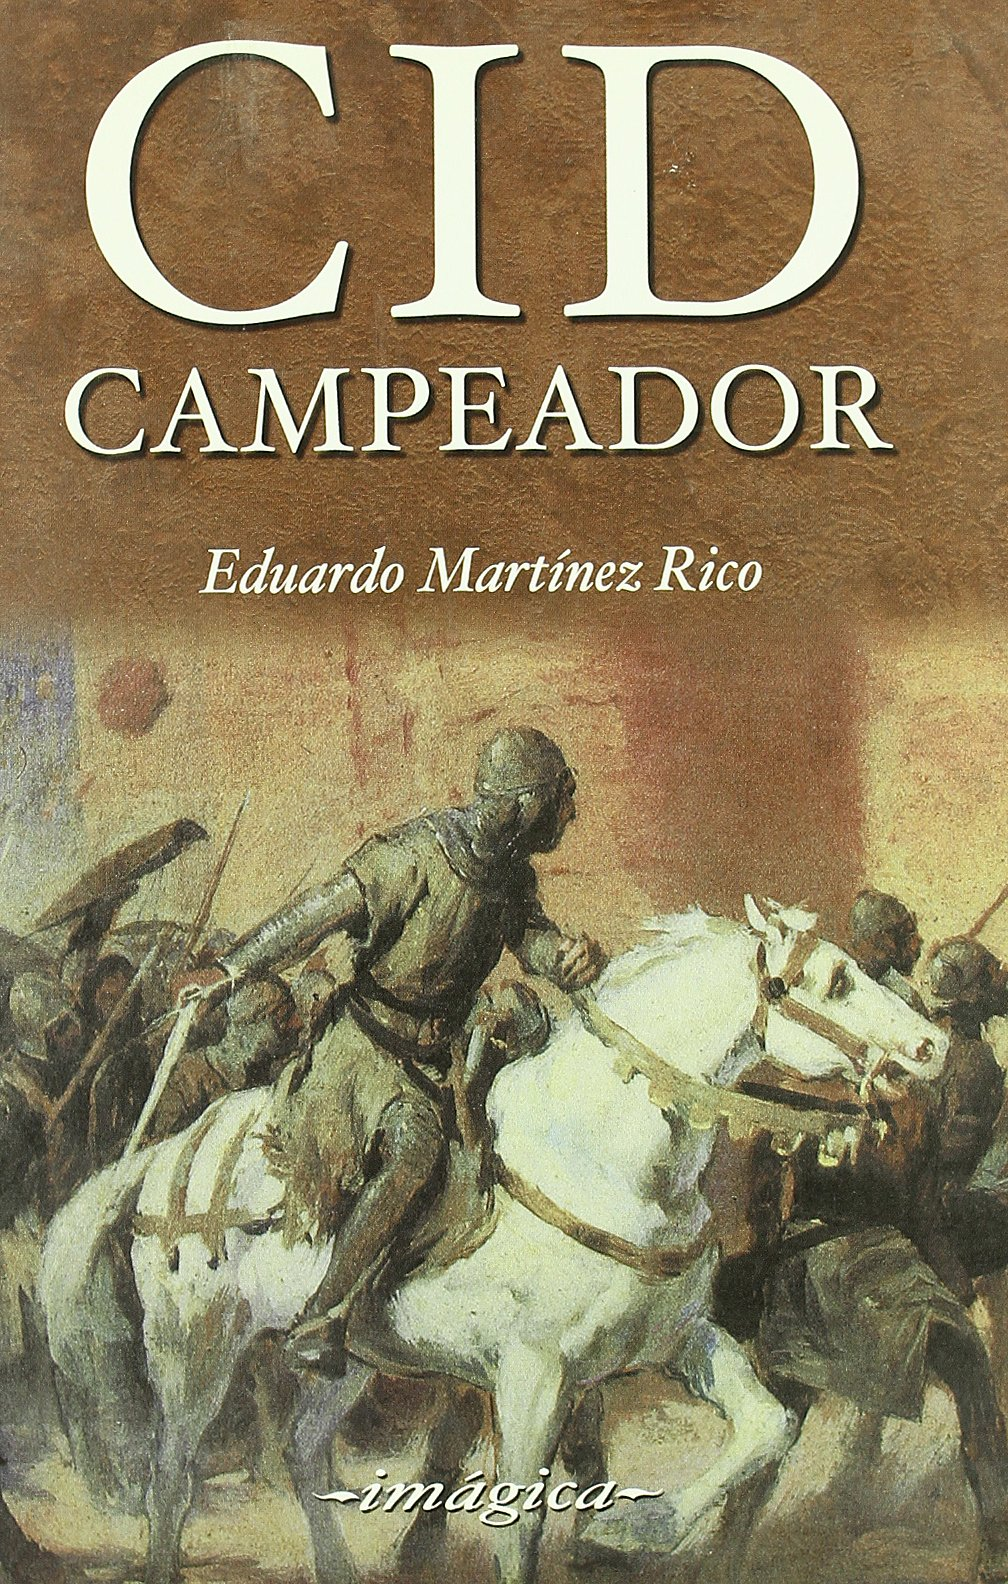 Cid Campeador Book Cover